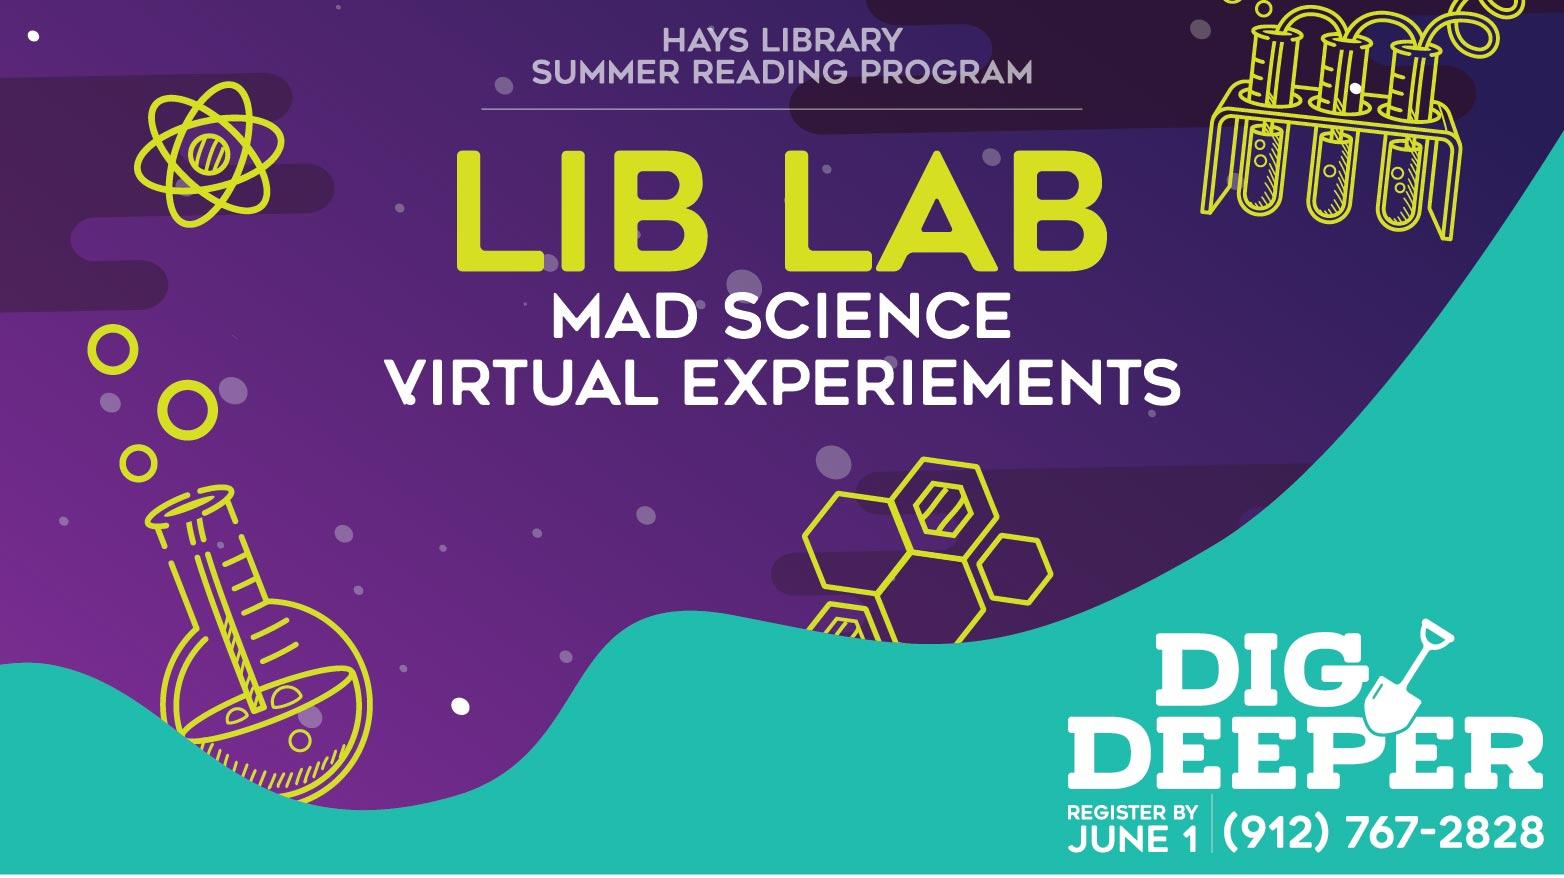 The Lib Lab - Summer Reading Activity